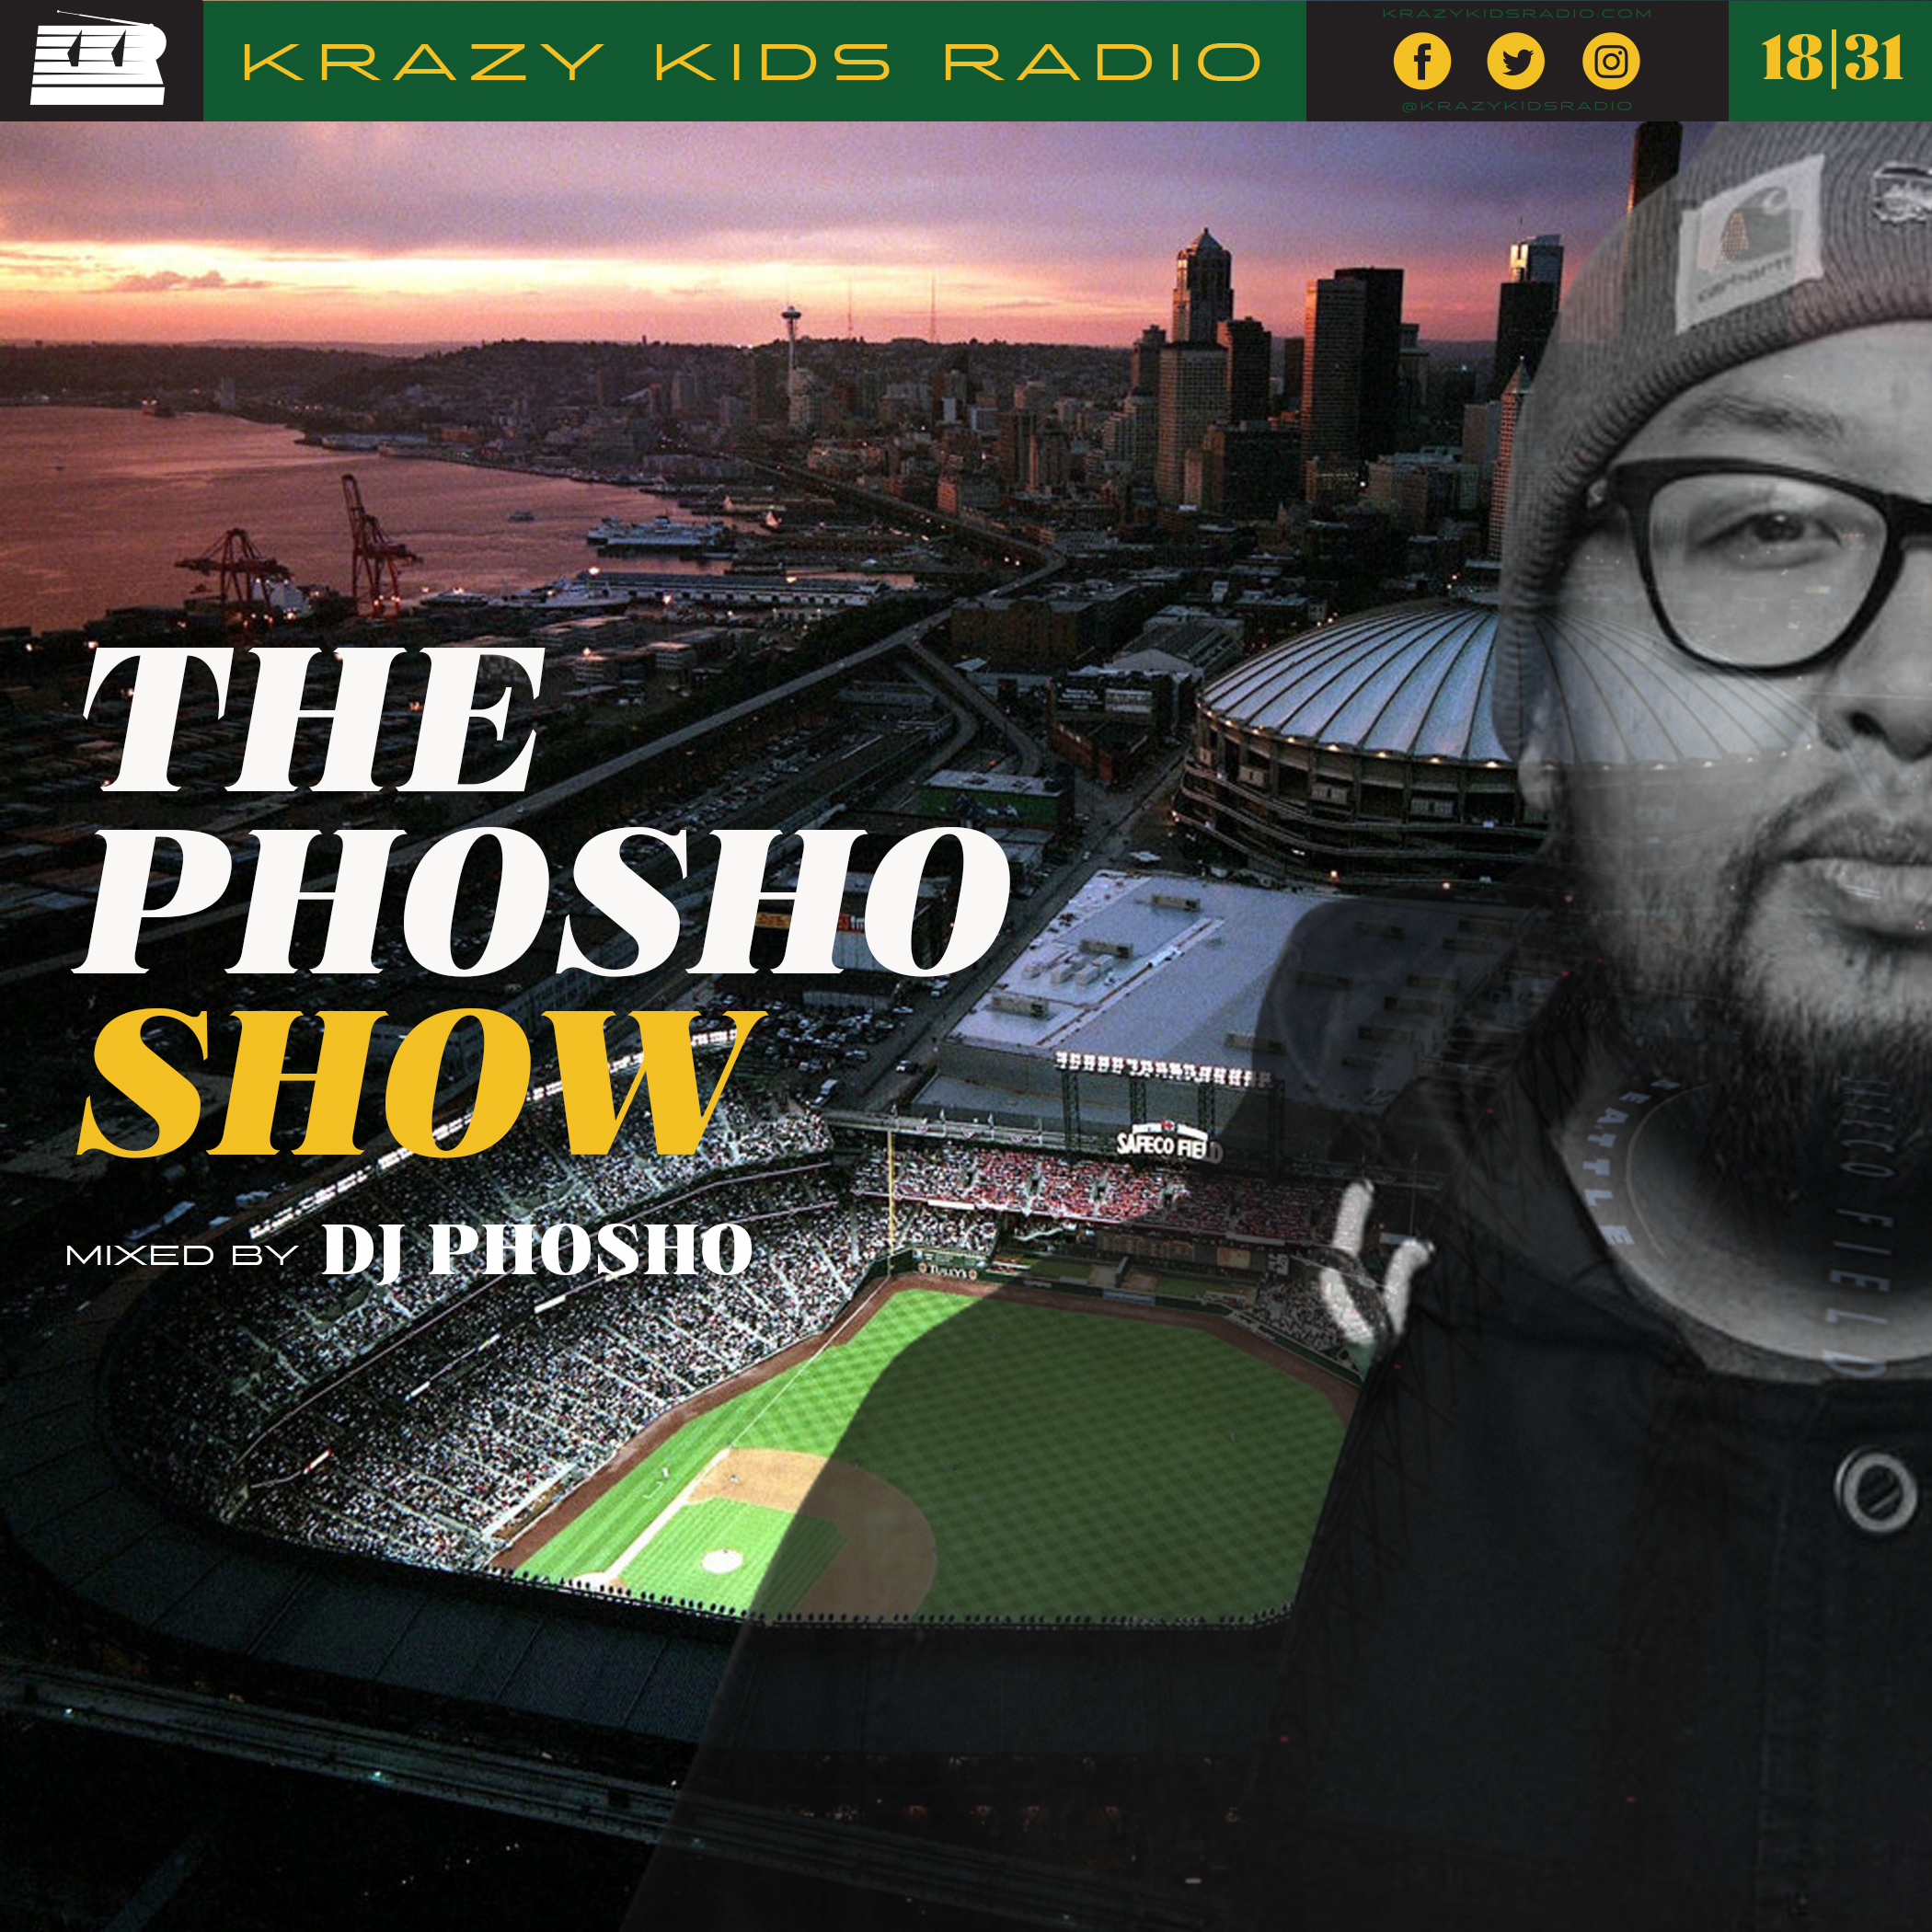 KKR_THE-PHOSHO-SHOW.jpg